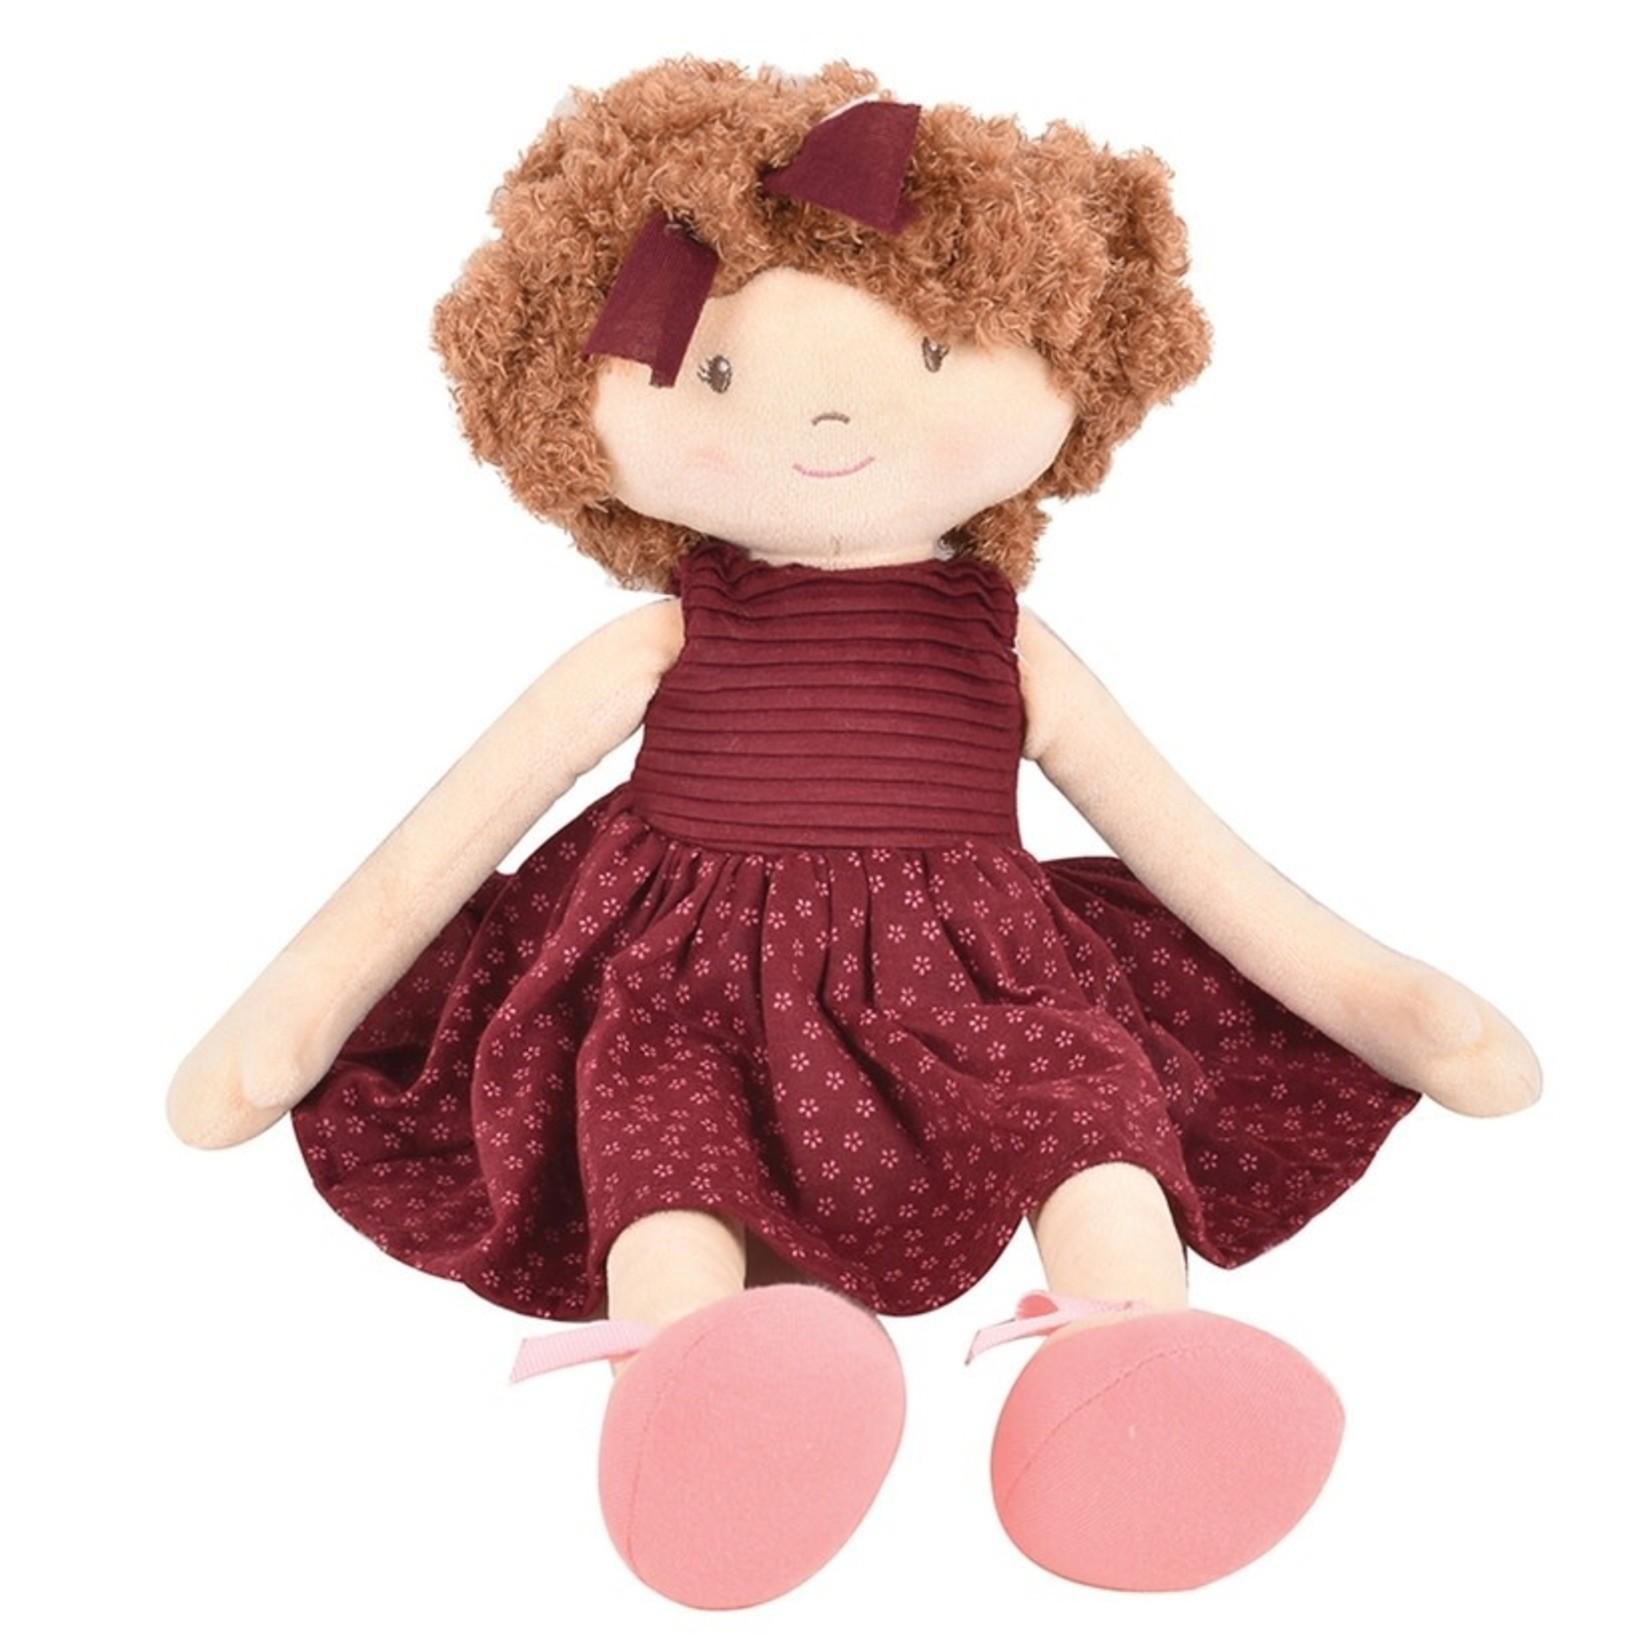 Tikiri Toys Lola - Brown Hair with Maroon Dress